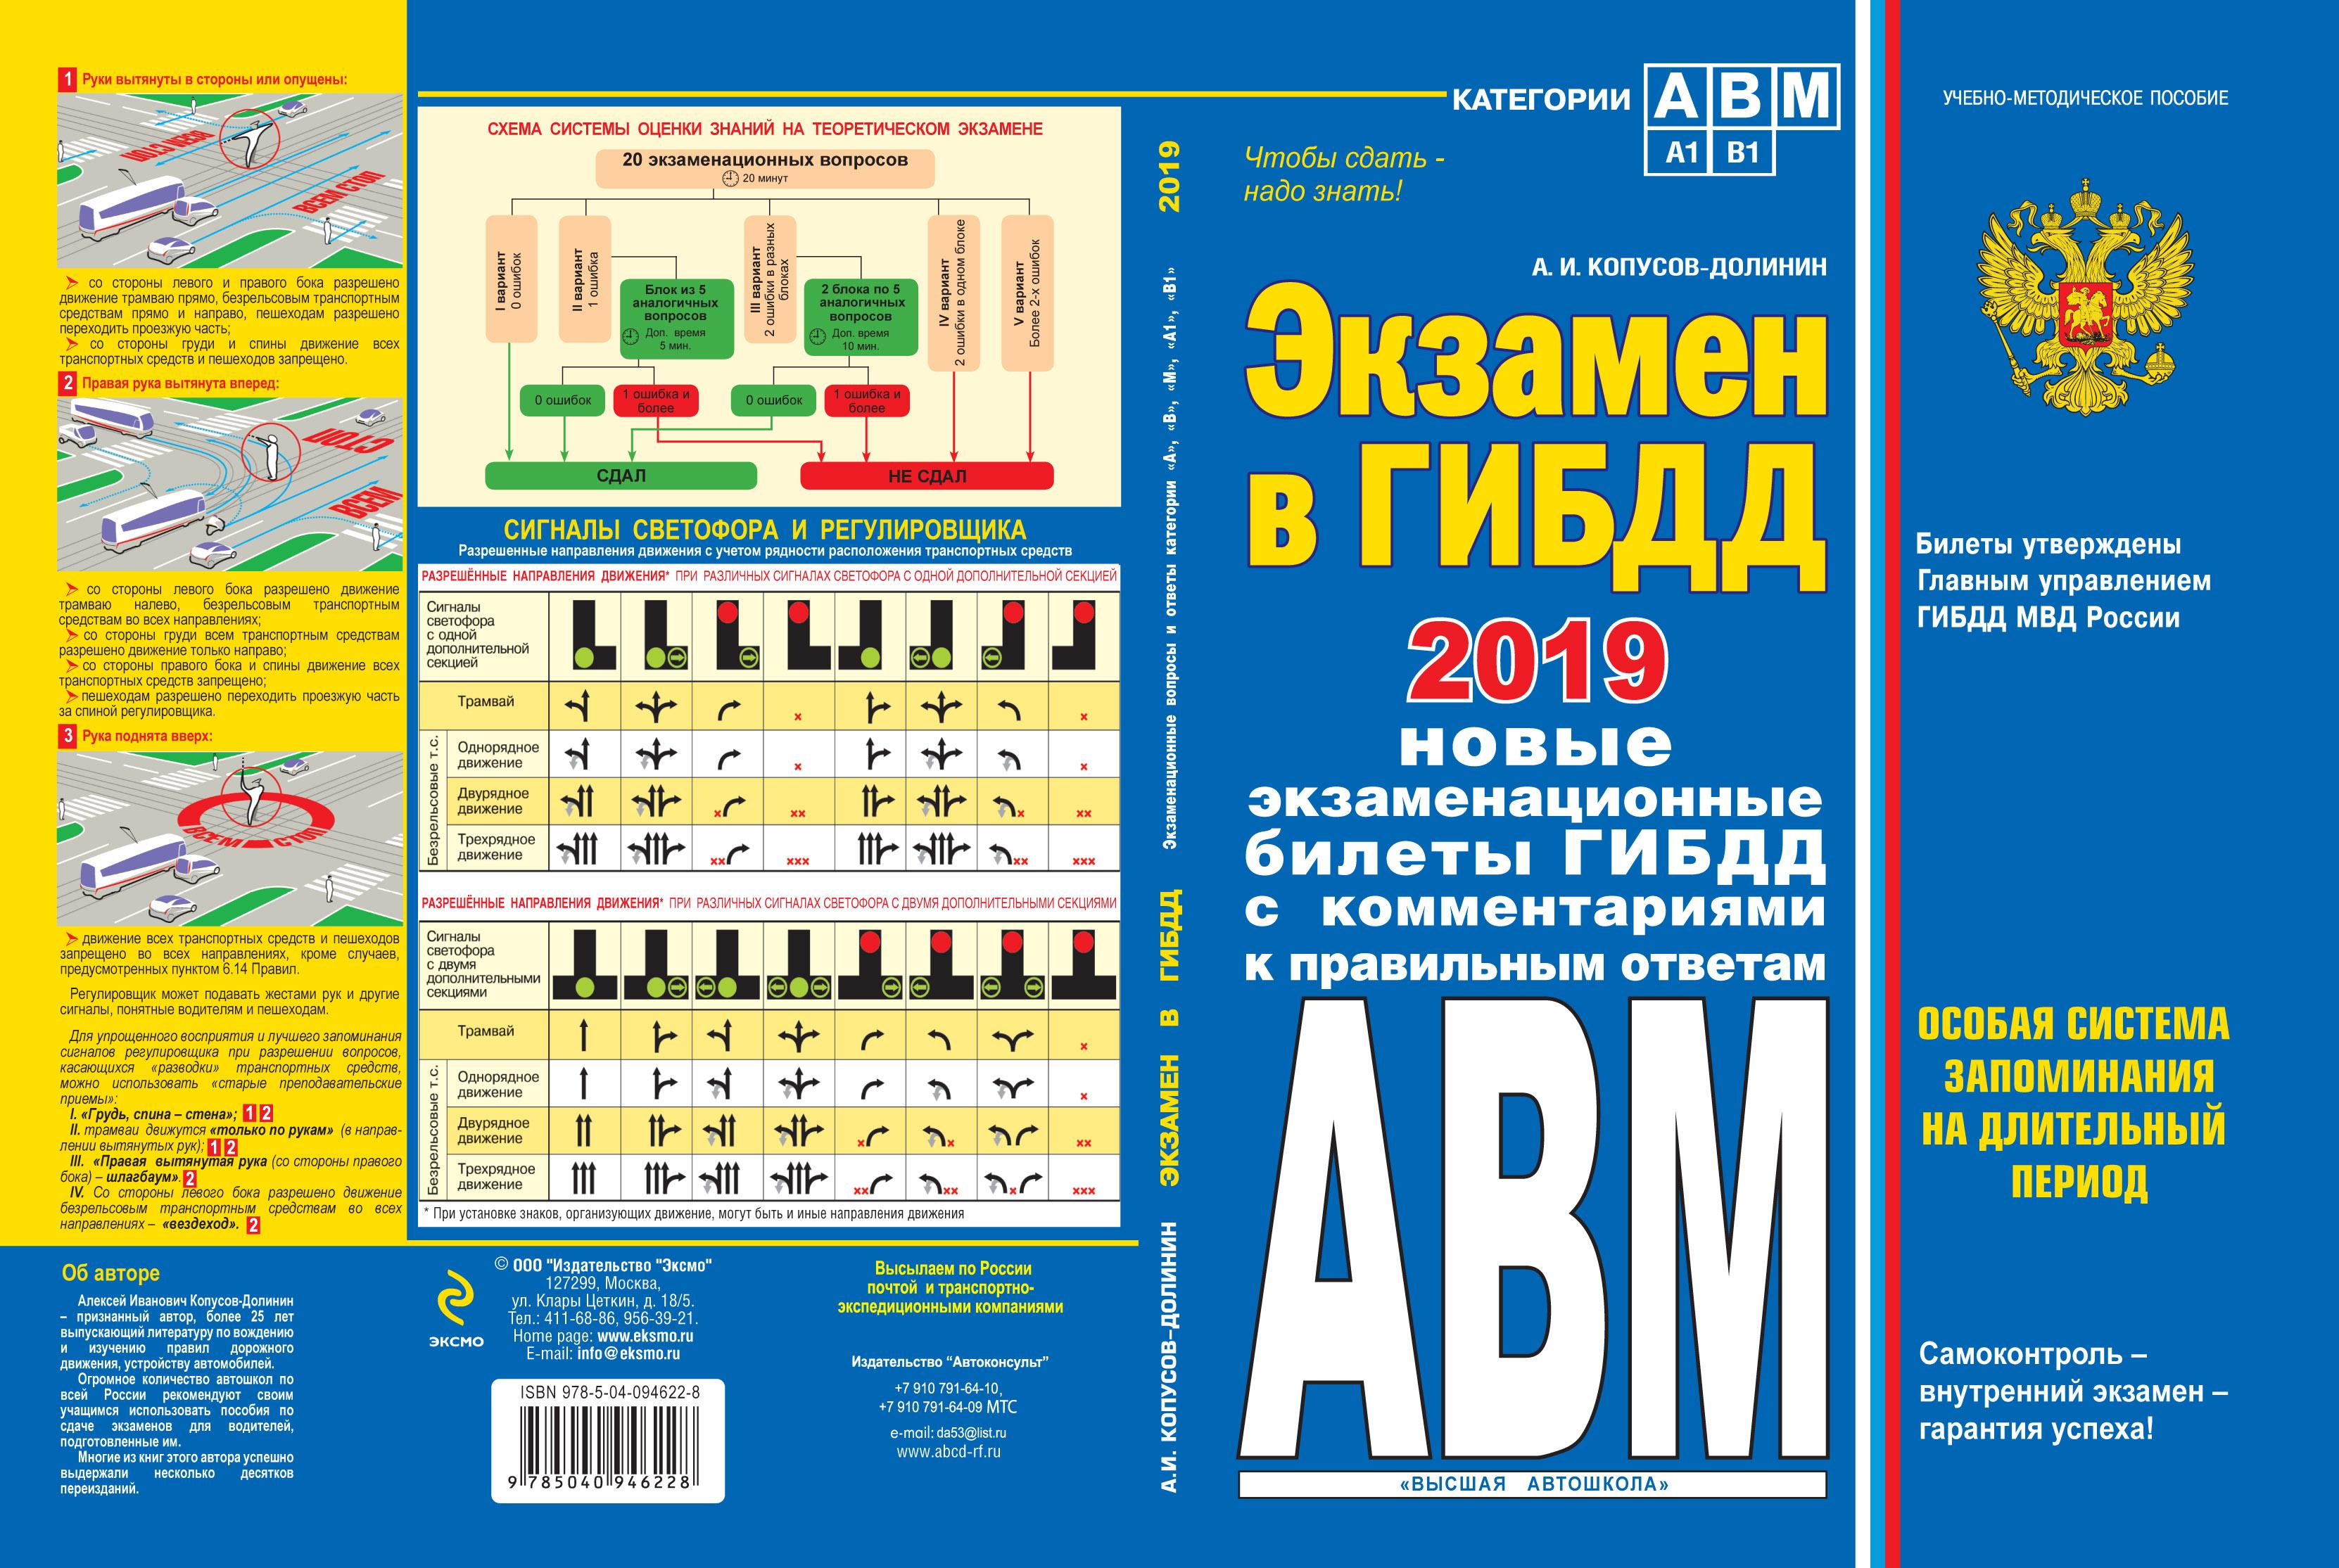 Копусов-Долинин А.И. Экзамен в ГИБДД. Категории А, В, M, подкатегории A1. B1 с изм. и доп. на 2019 год